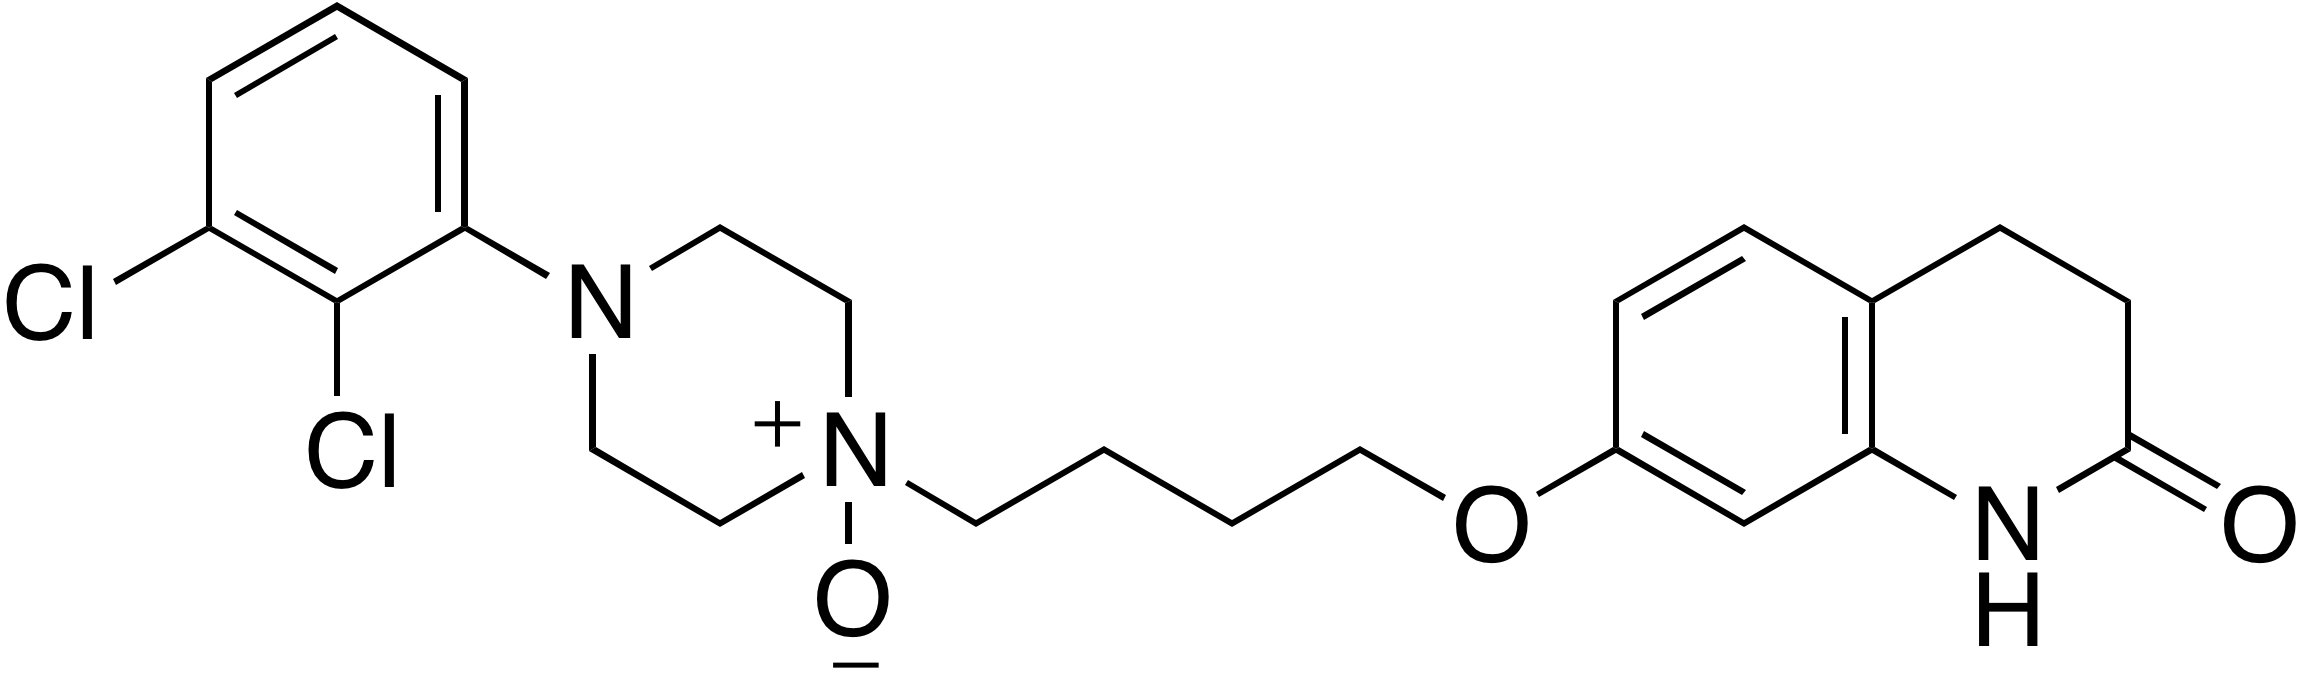 Aripiprazole N1-oxide